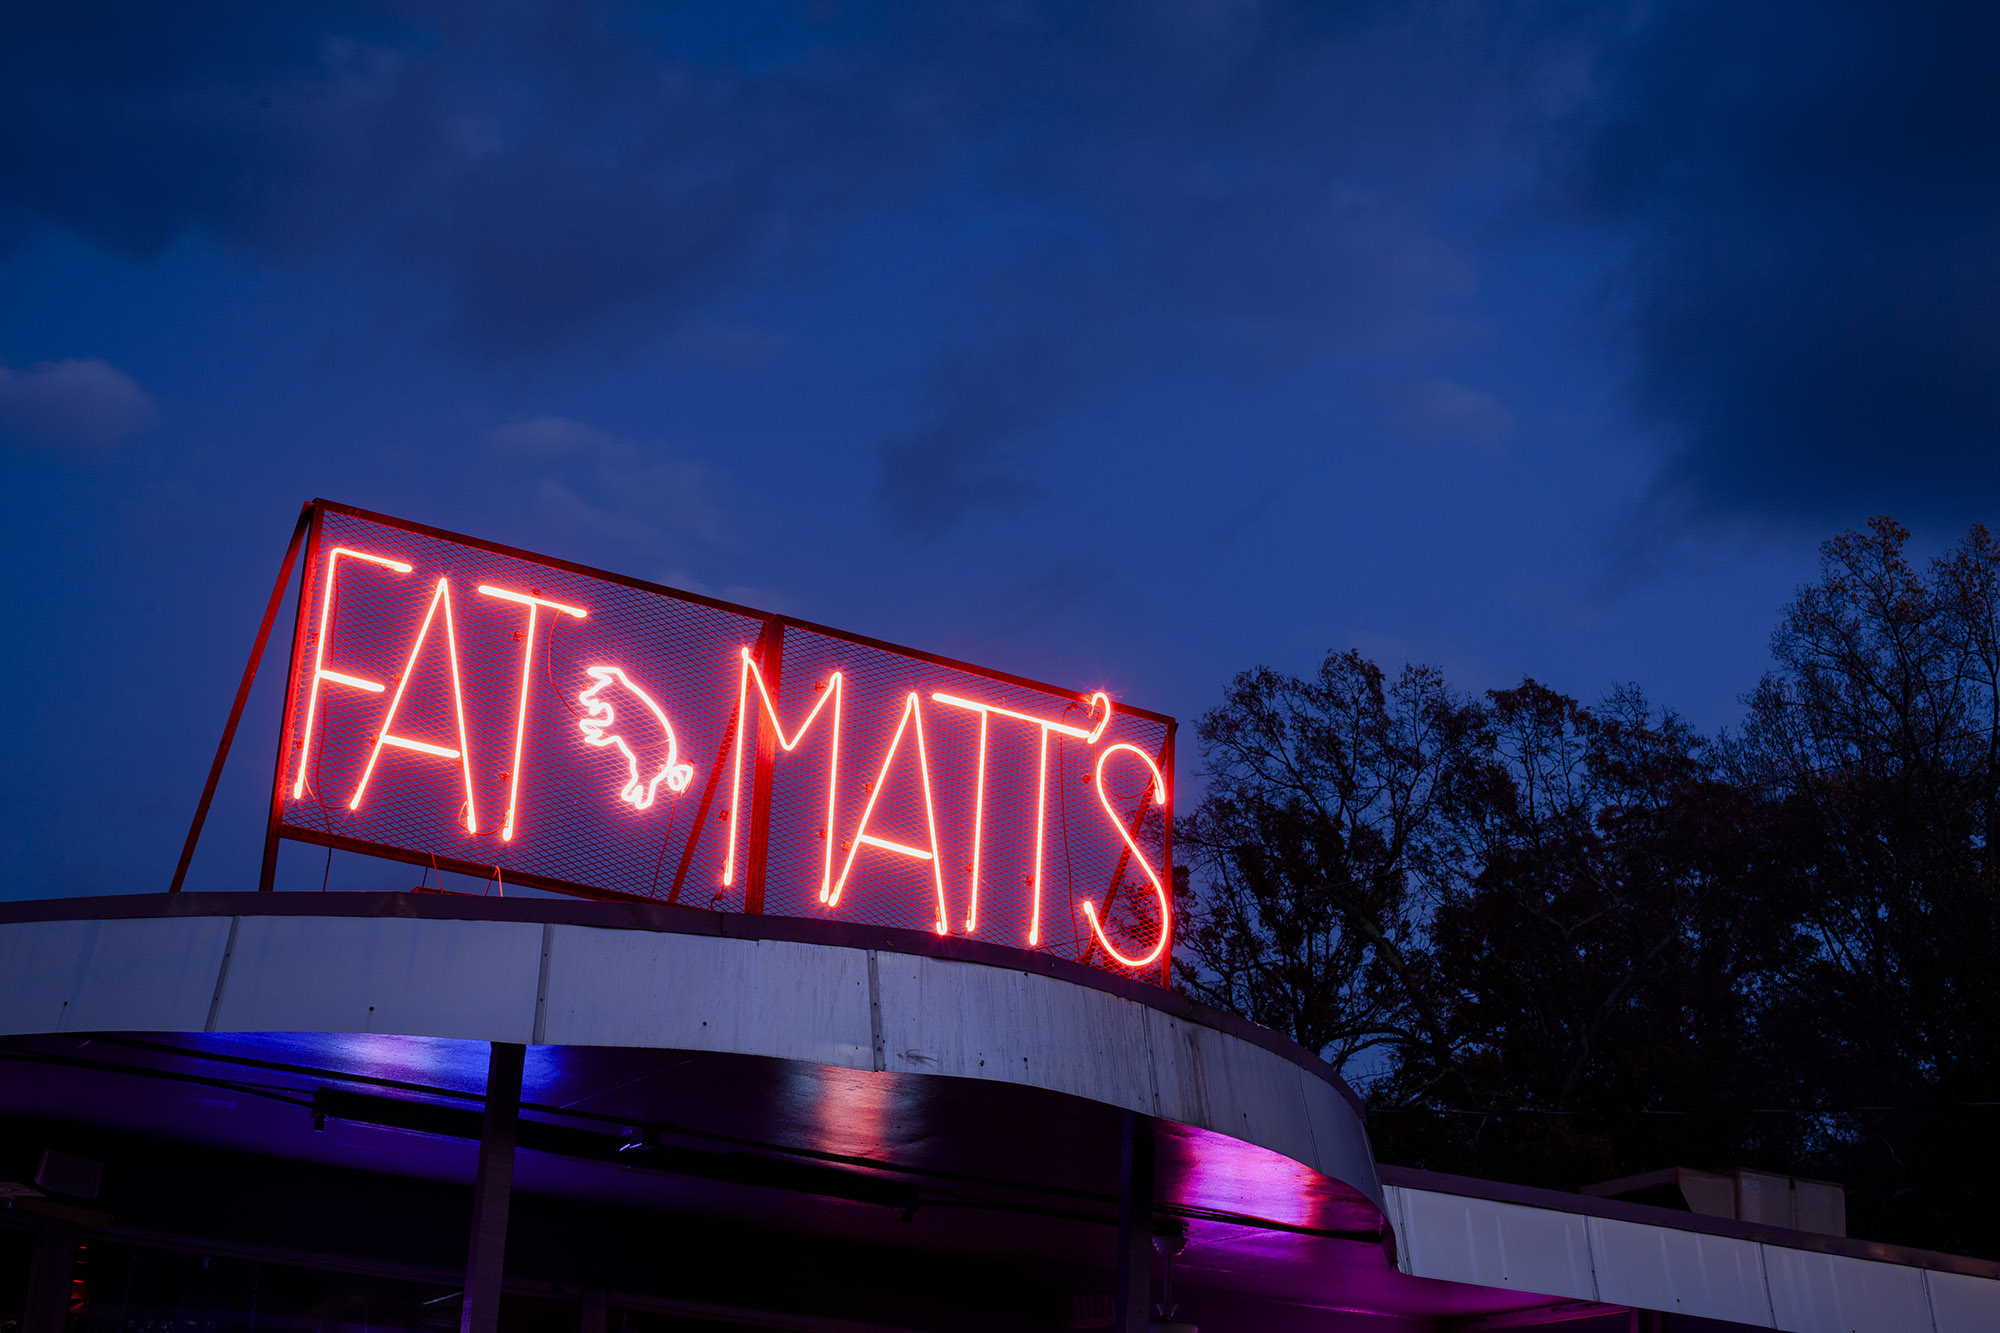 FatMatts15Resize.jpg